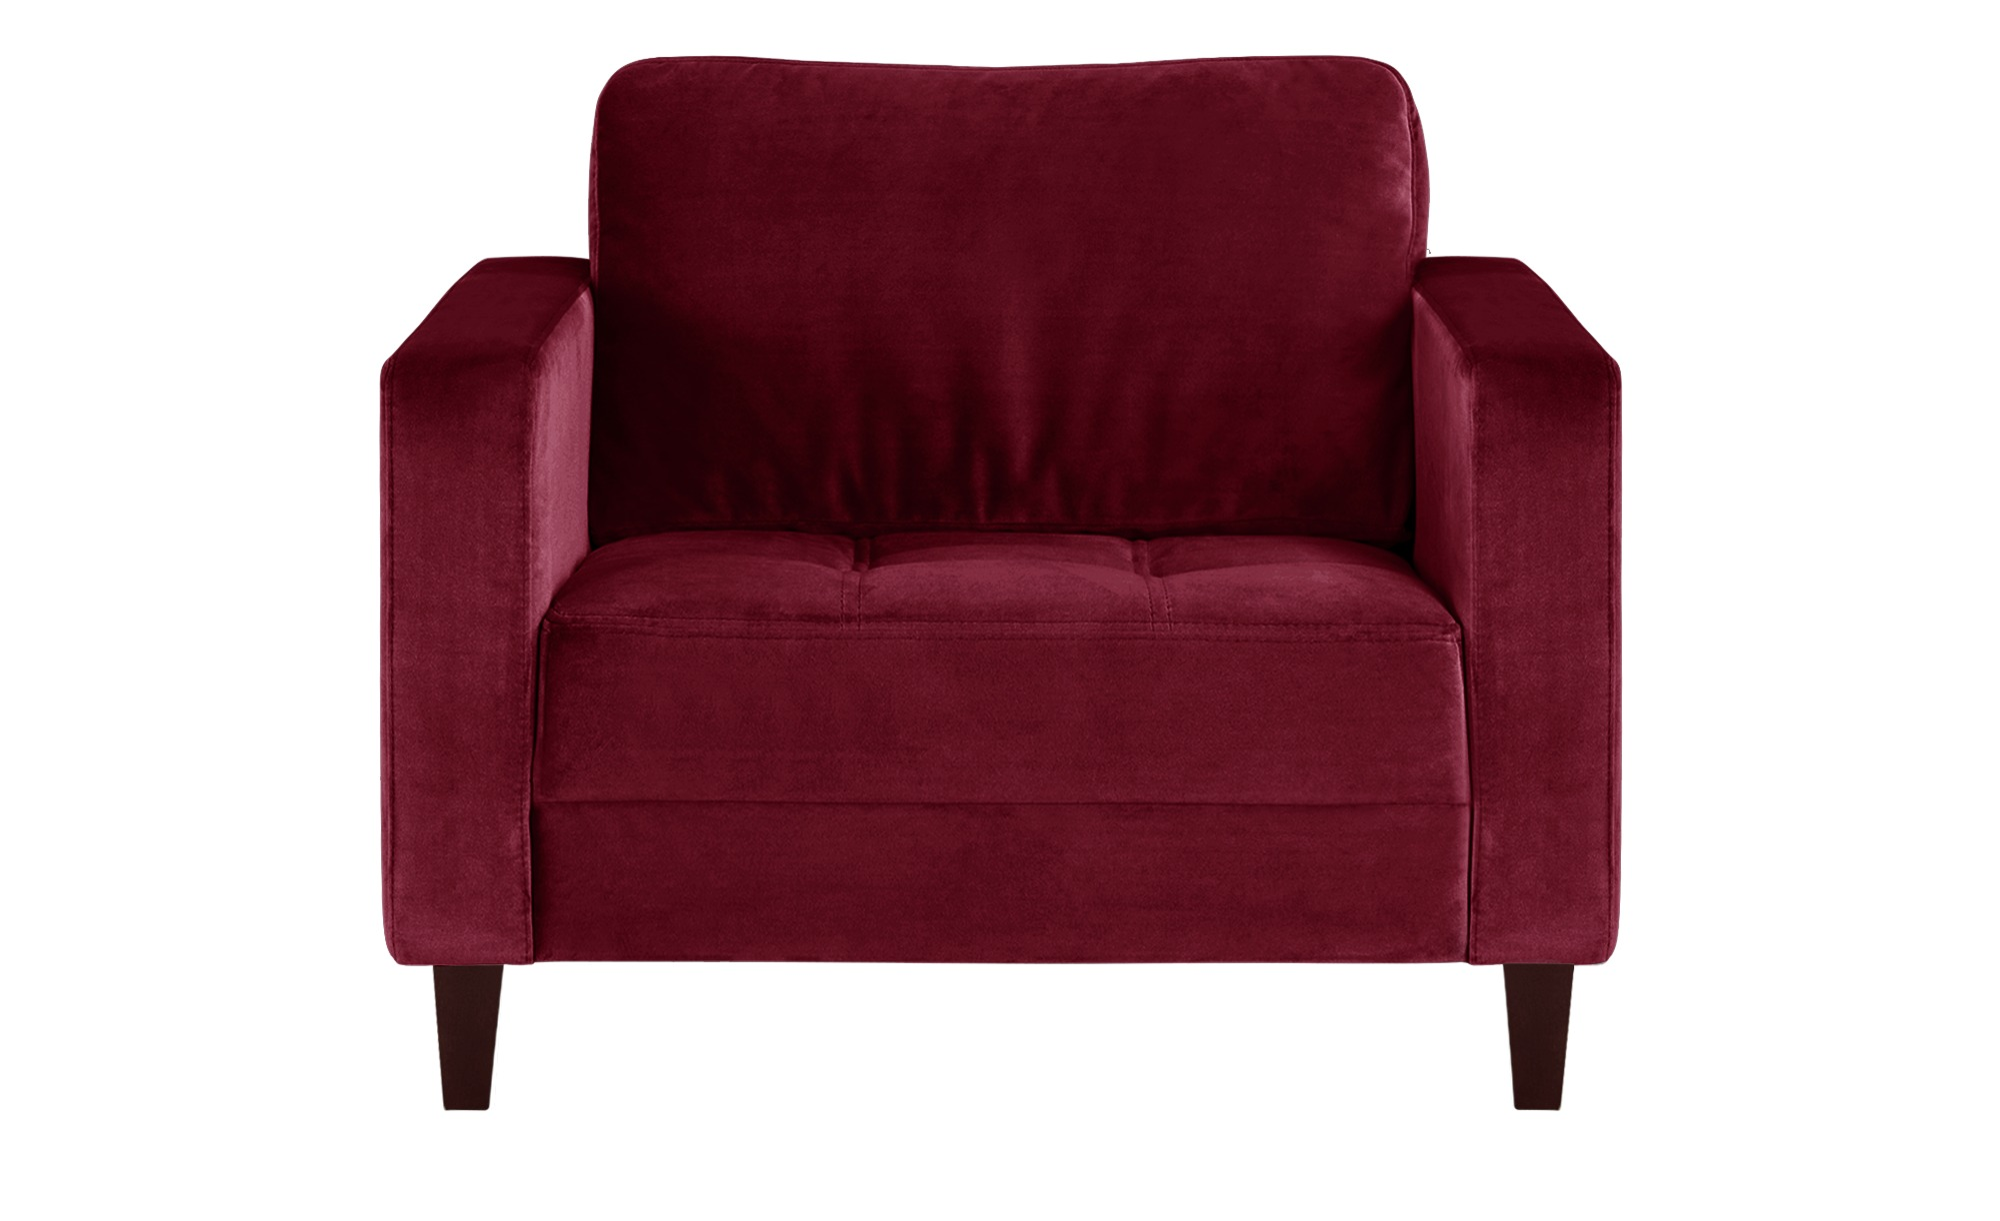 smart Sessel rot - Stoff Geradine ¦ rot ¦ Maße (cm): B: 102 H: 83 T: 91 Polstermöbel > Sessel > Polstersessel - Höffner